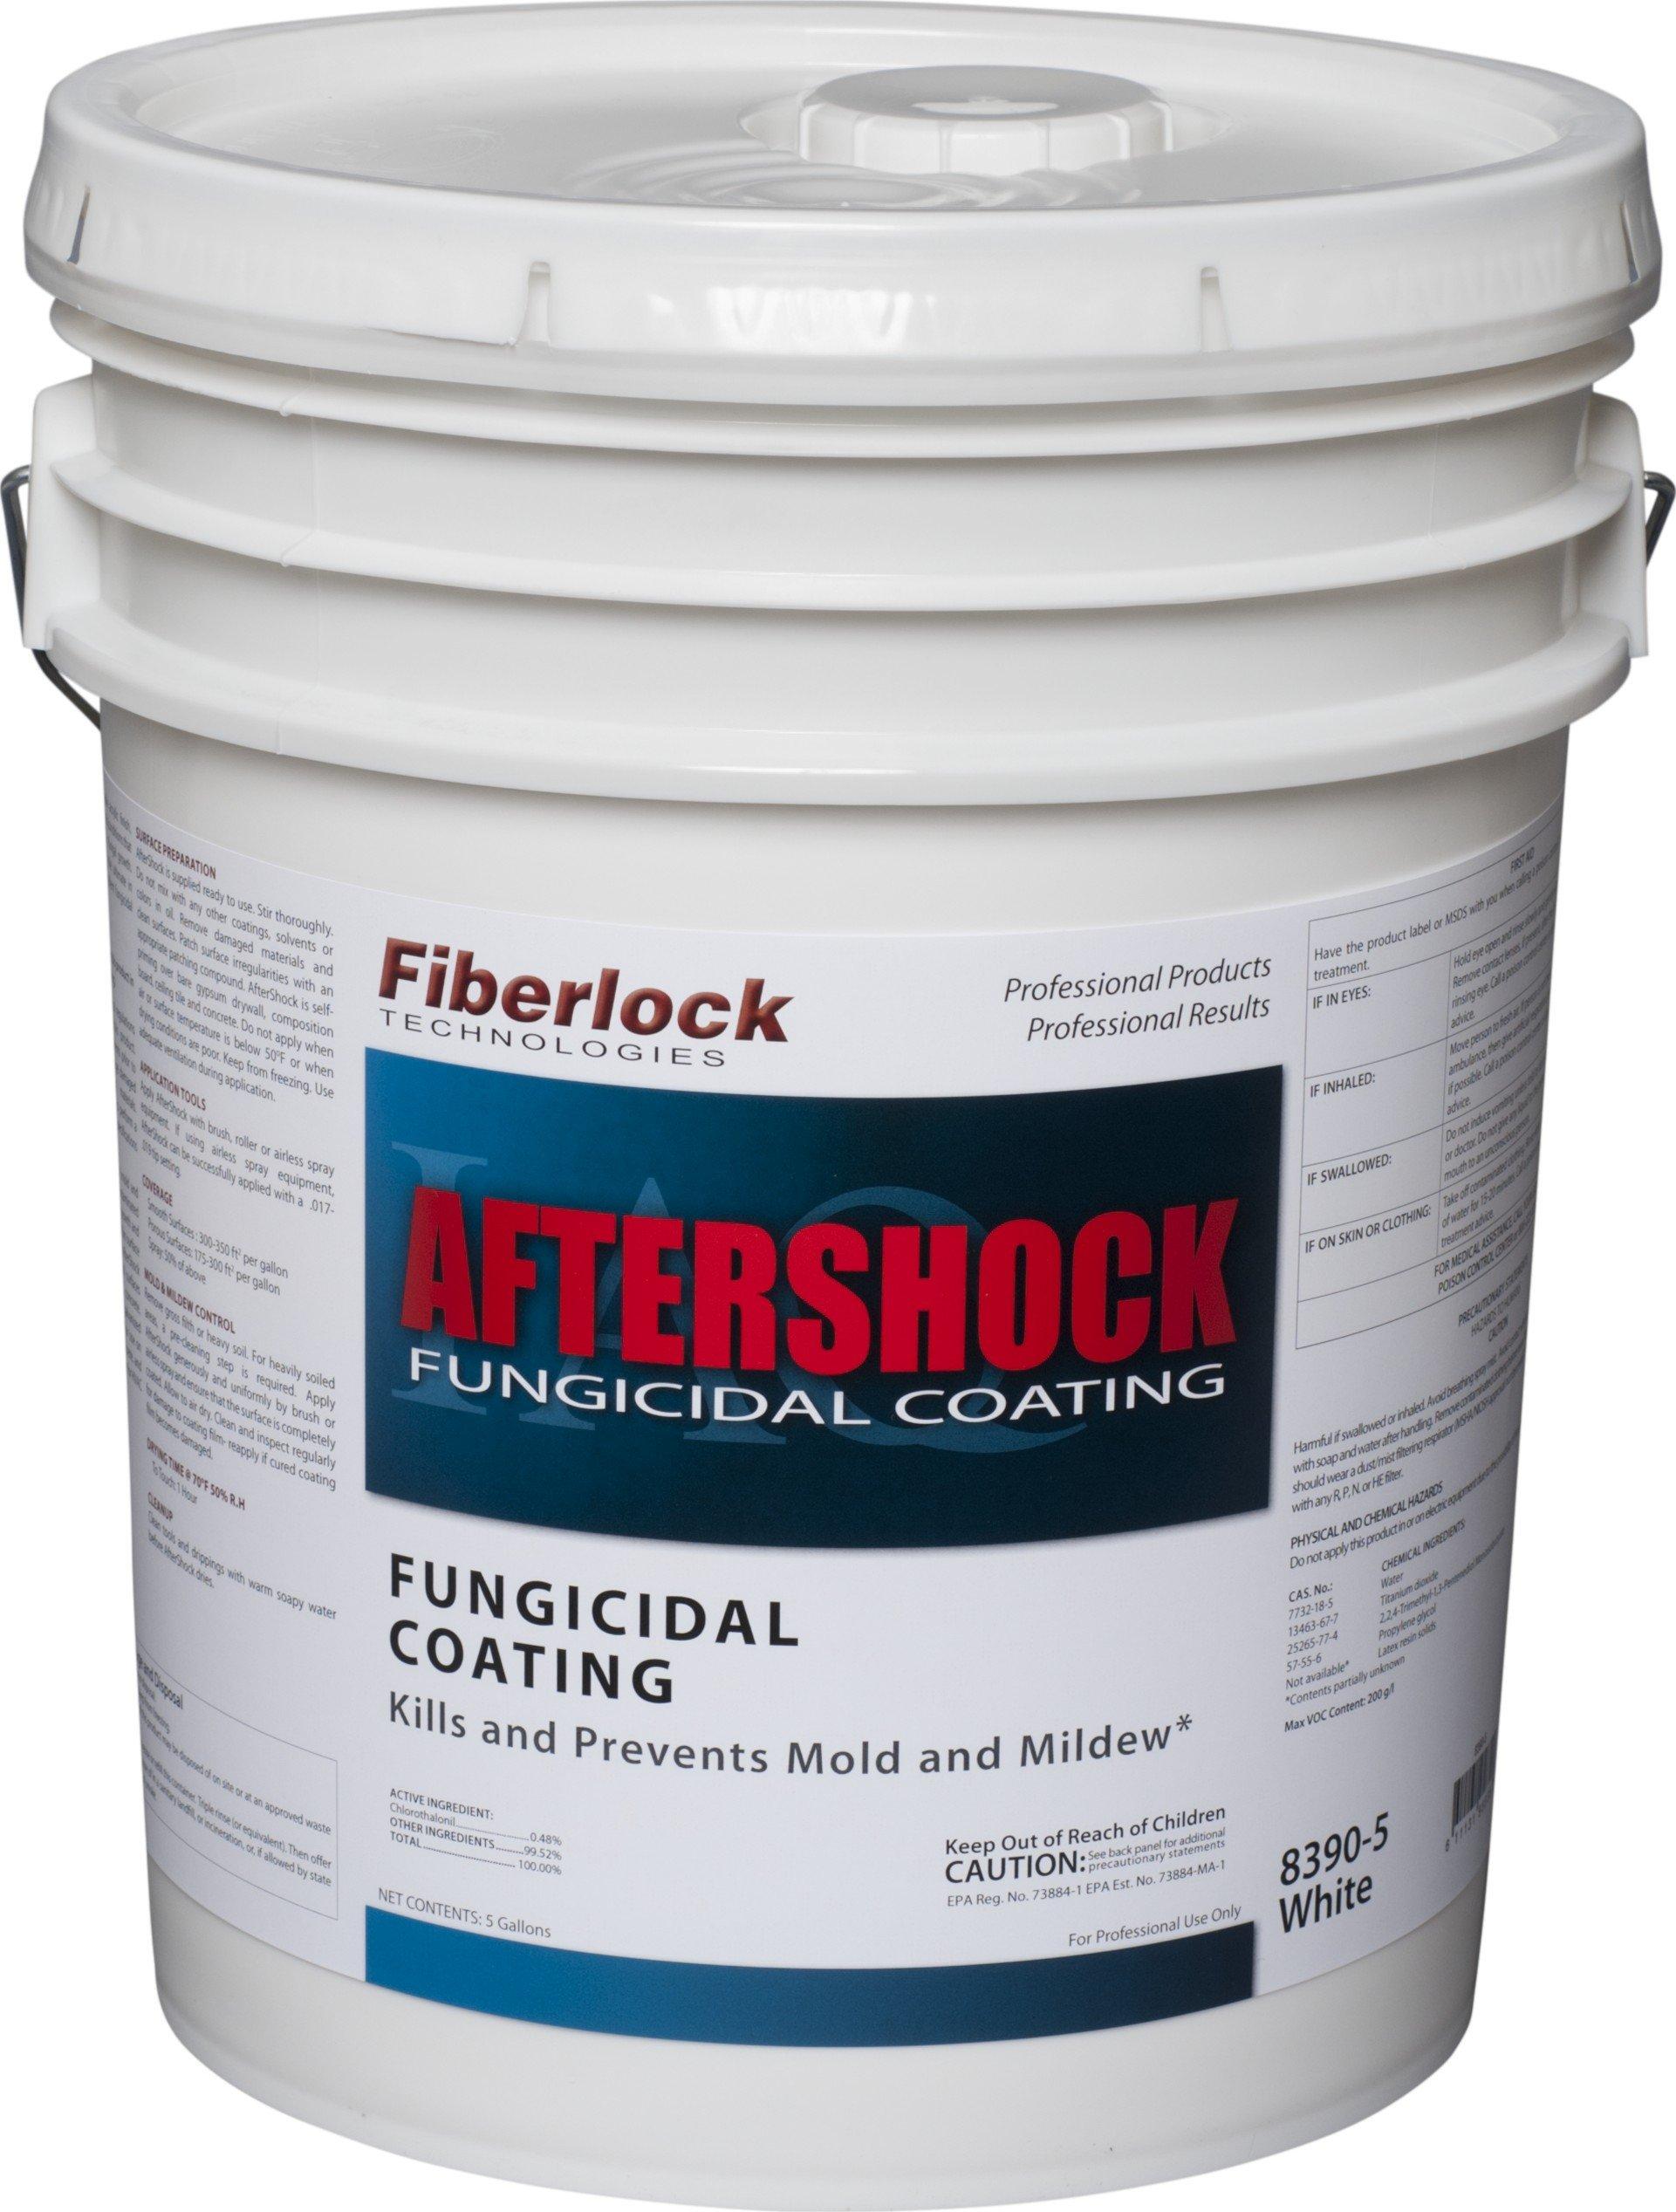 Fiberlock - Aftershock - EPA Registered Fungicidal Coating - 5 Gallon Pail - 8390